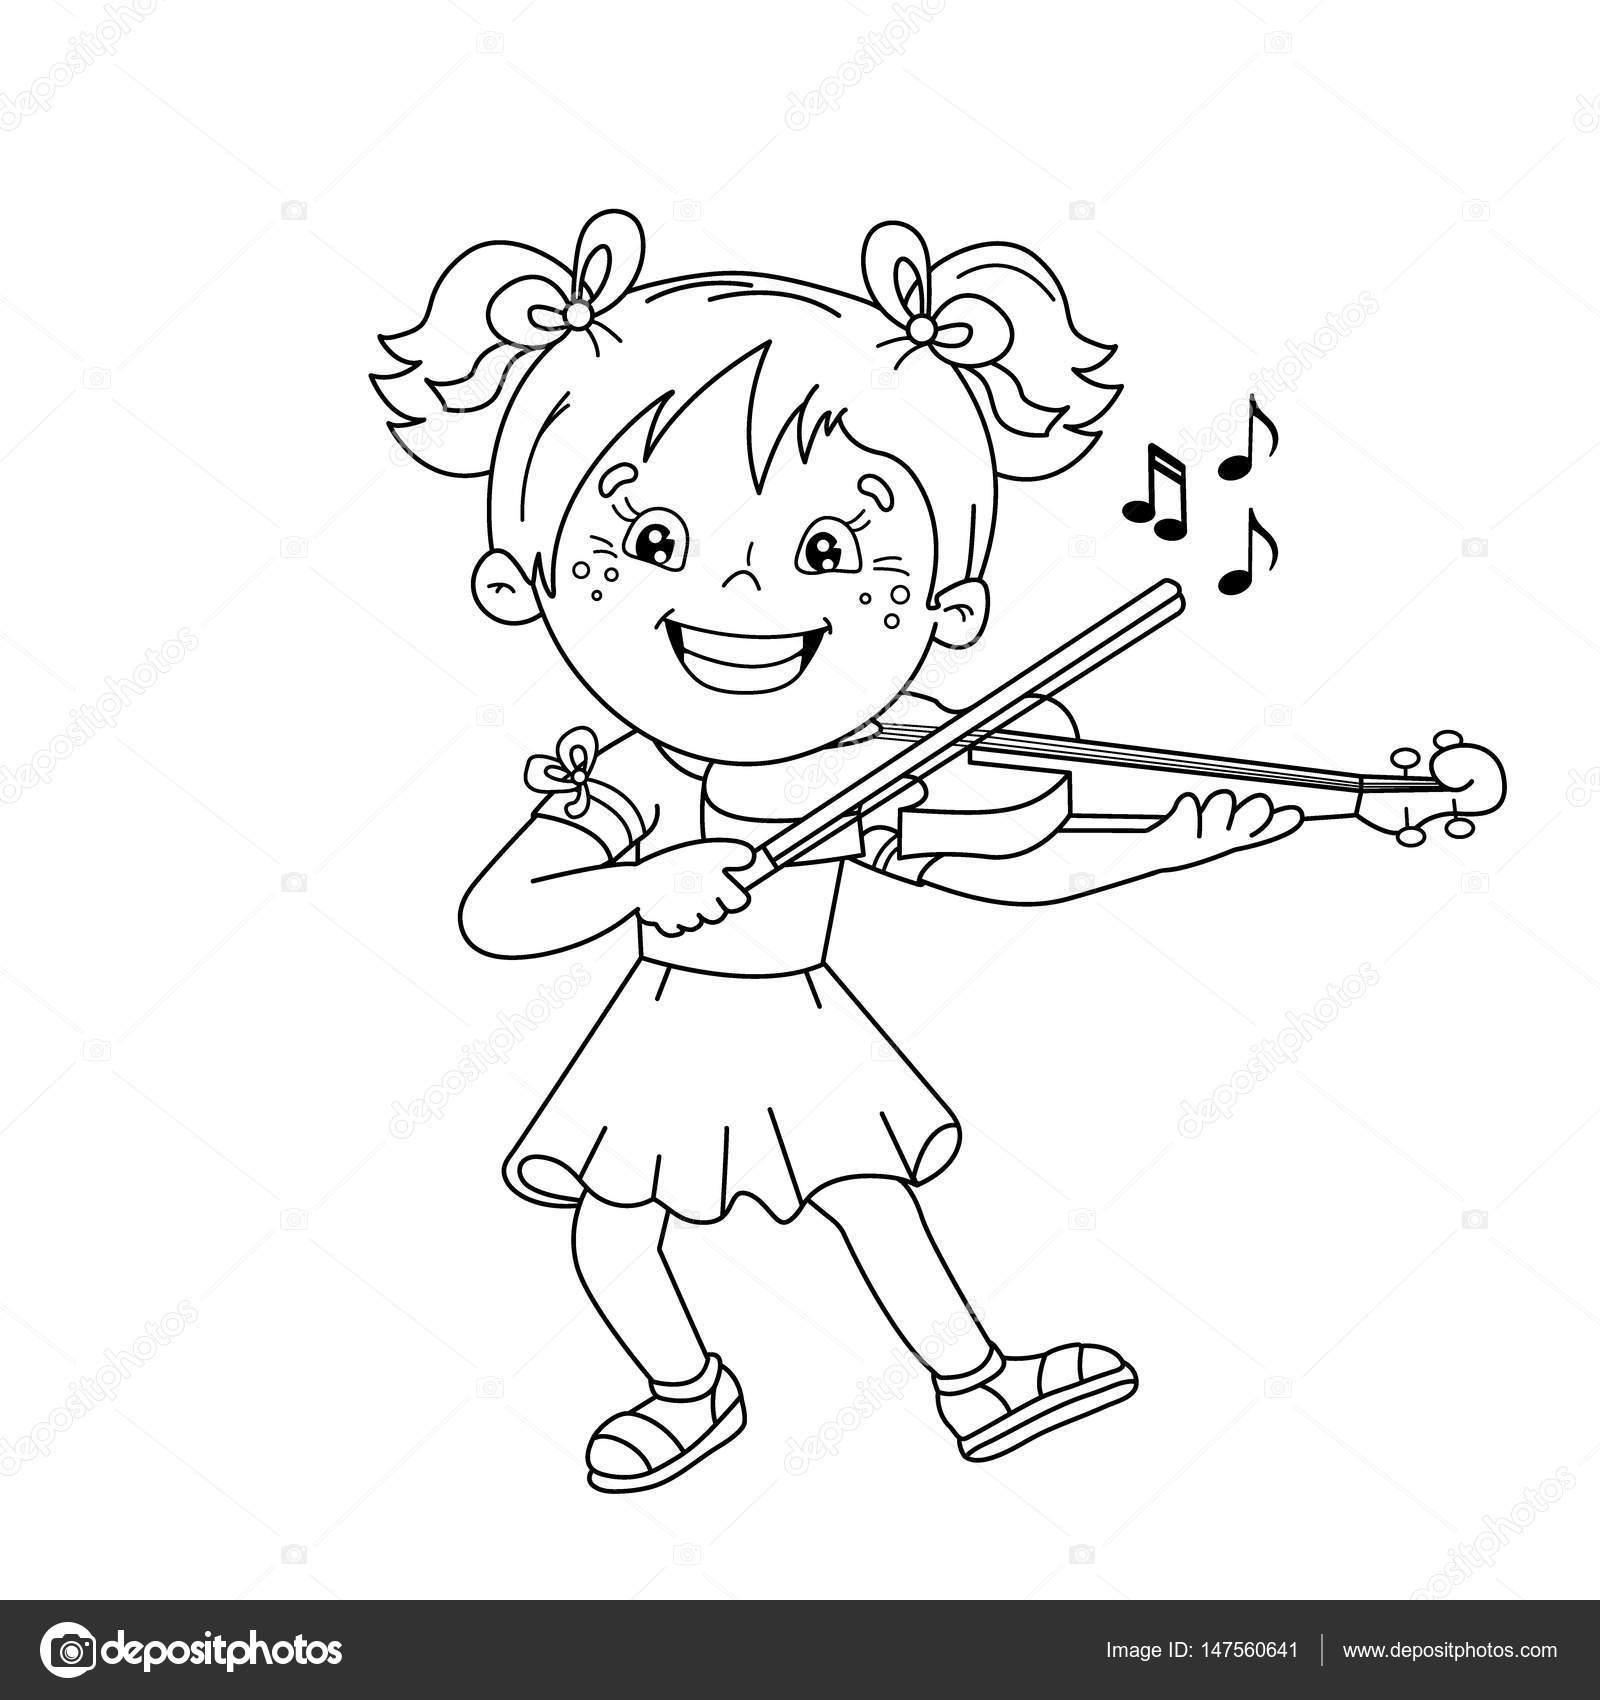 Para colorear esquema de página de dibujos animados niña ...